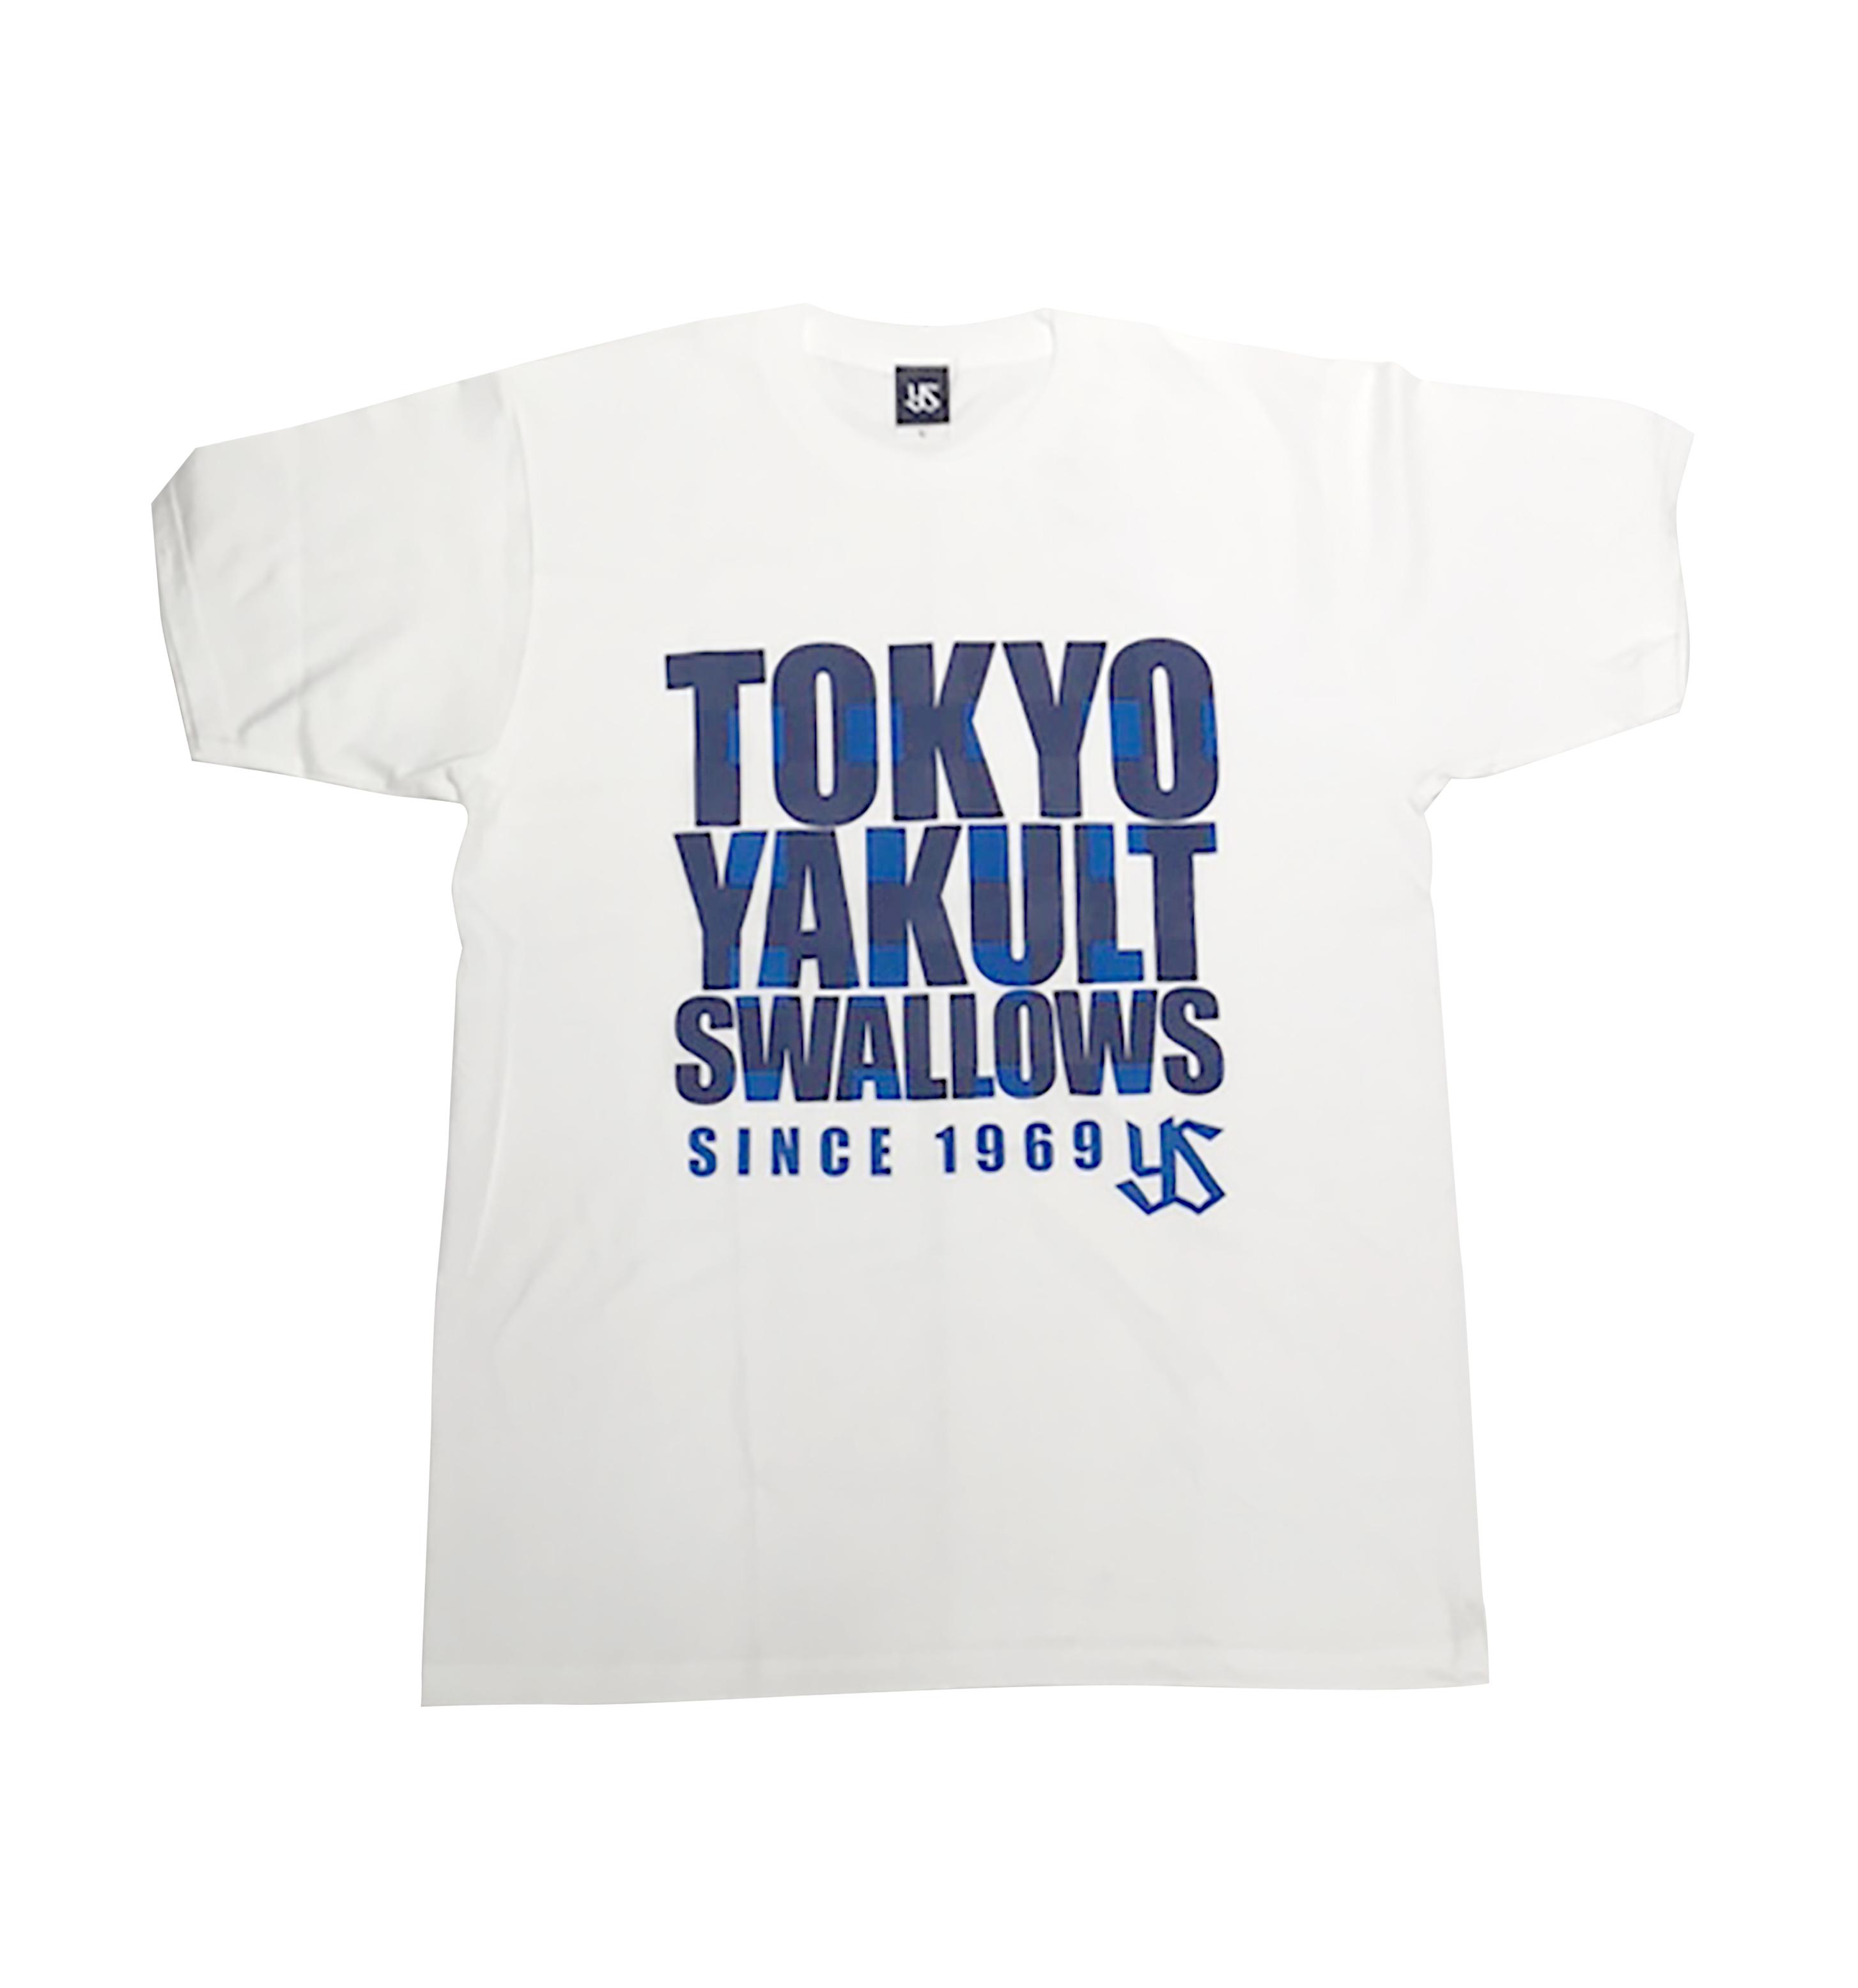 SwallowsブロックチェックロゴTシャツ